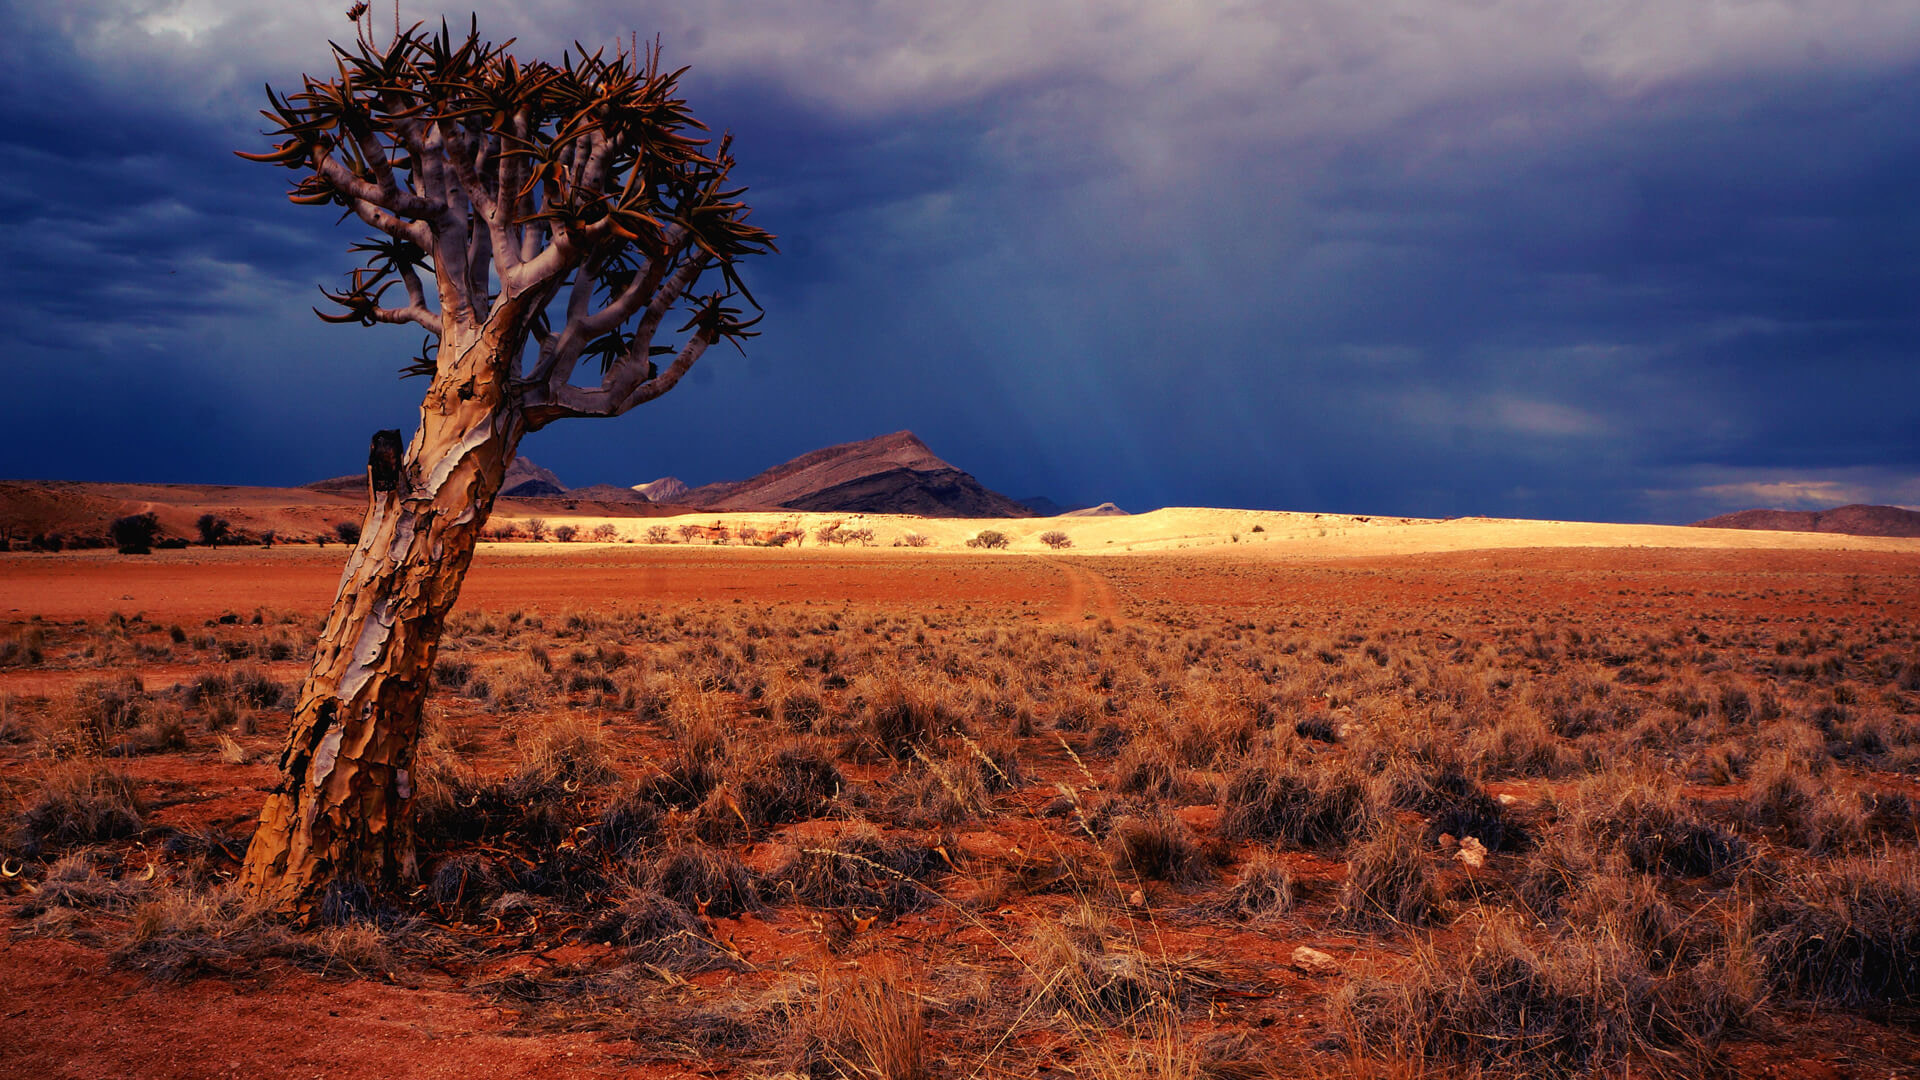 Familienreisen Namibia webook.ch